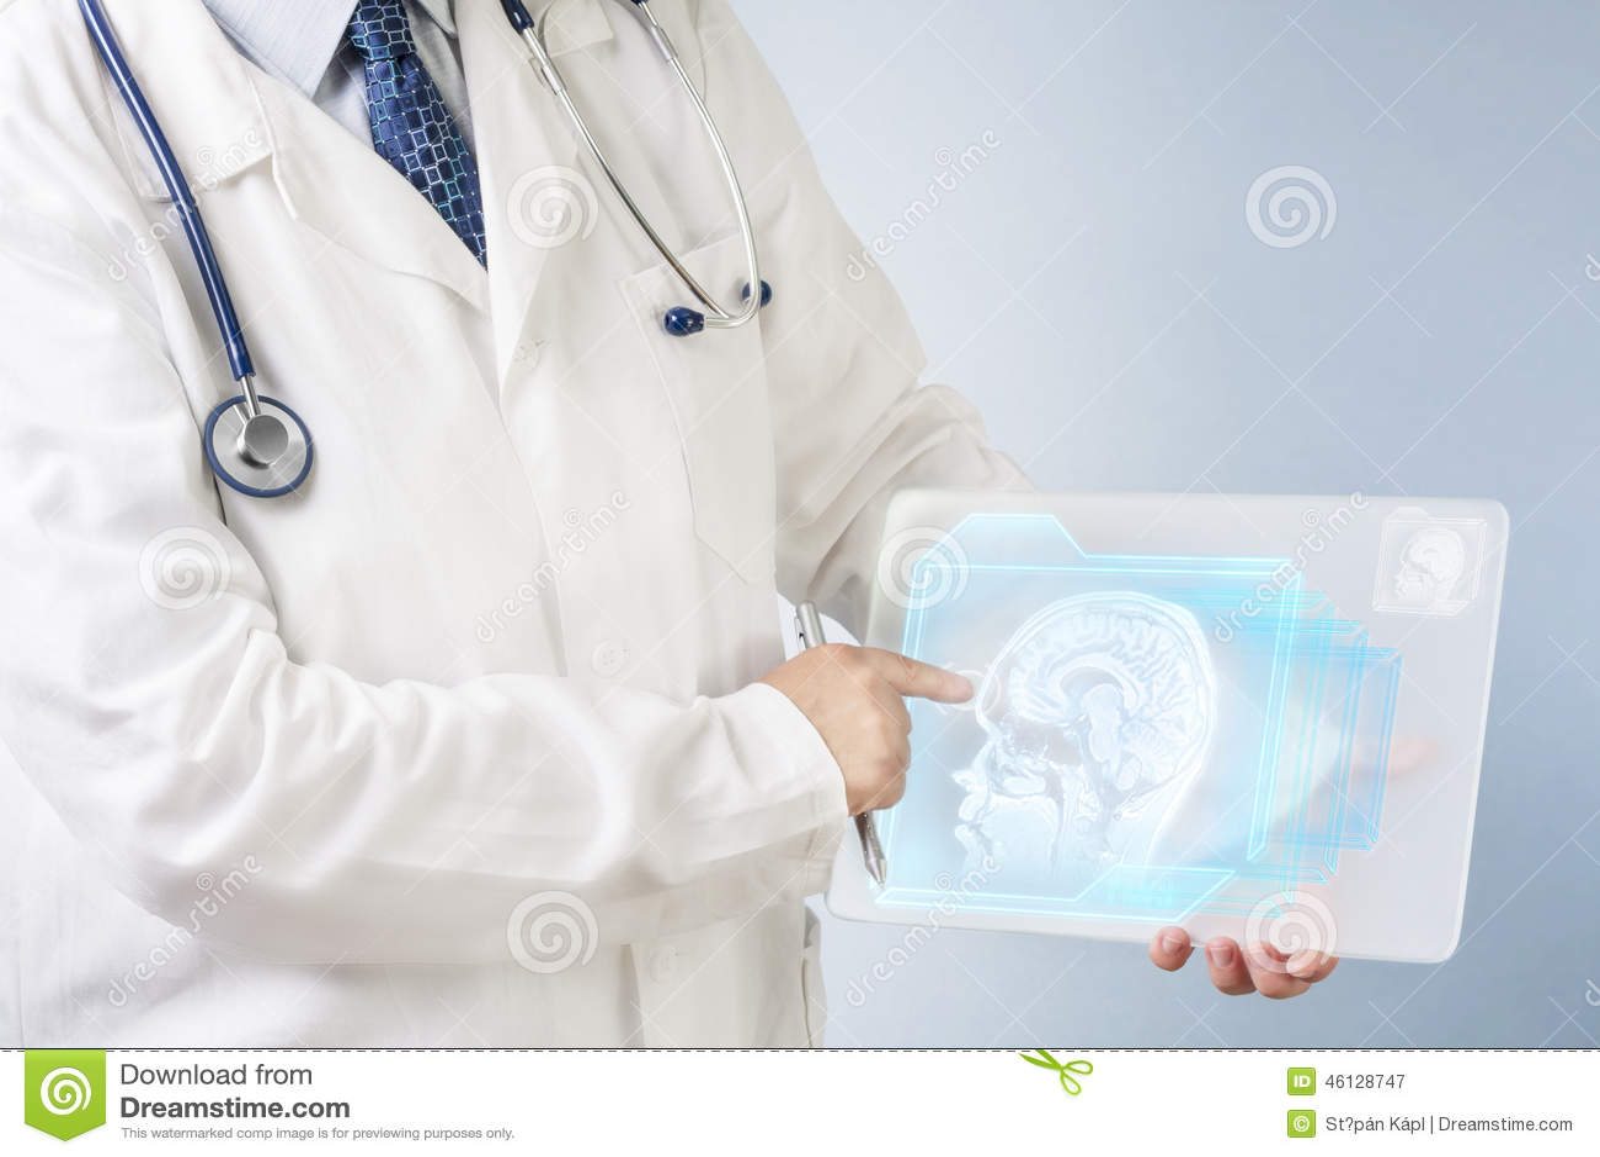 Doctor analyzing brain image